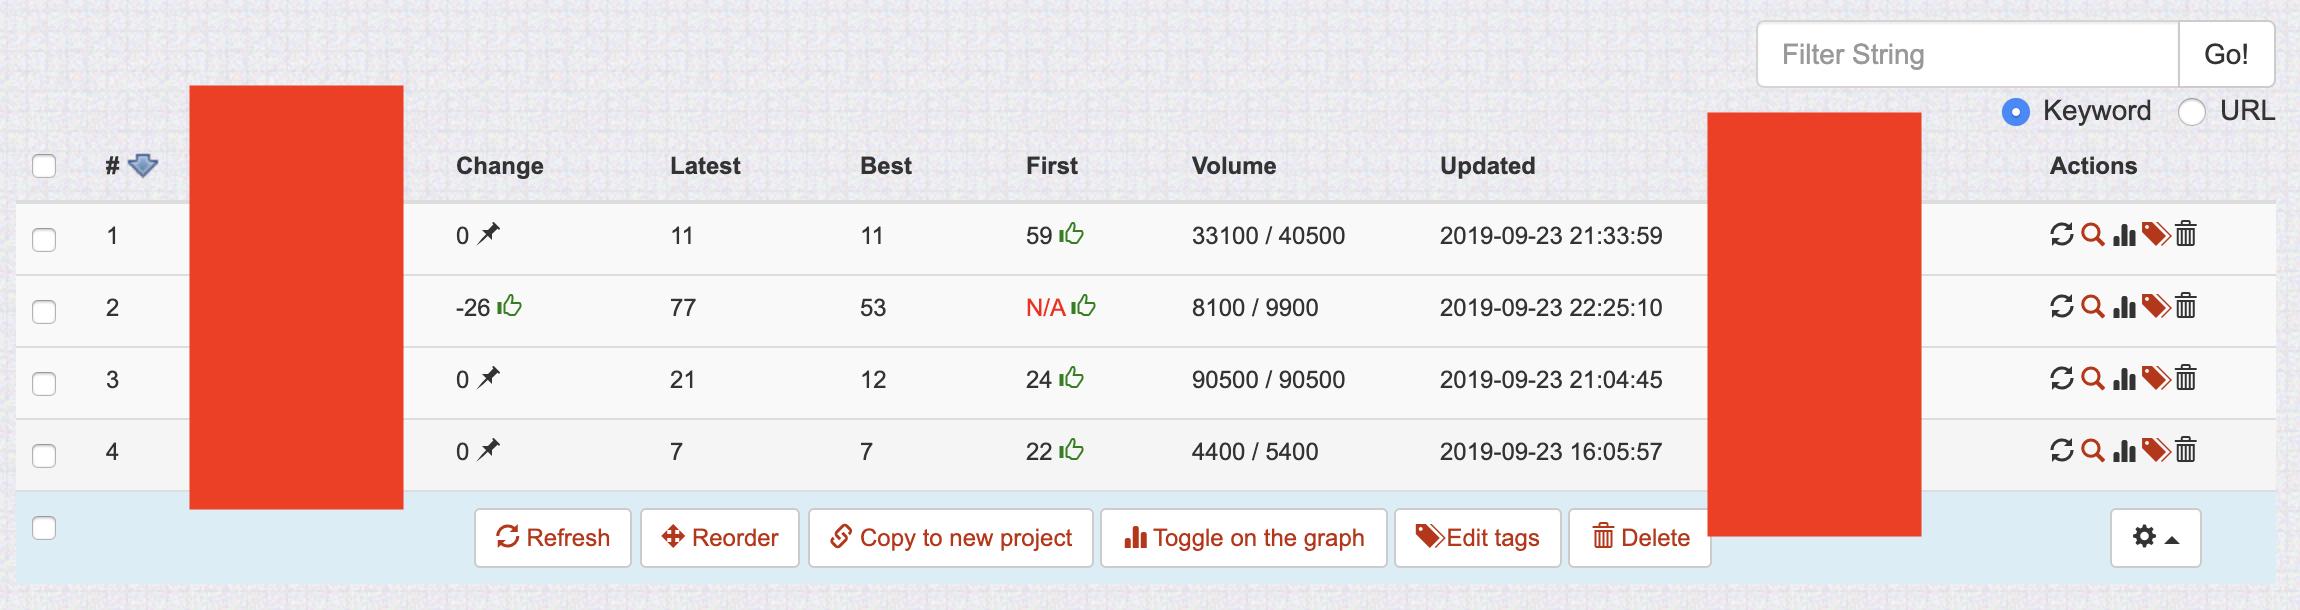 Expired Rankings Serprobot